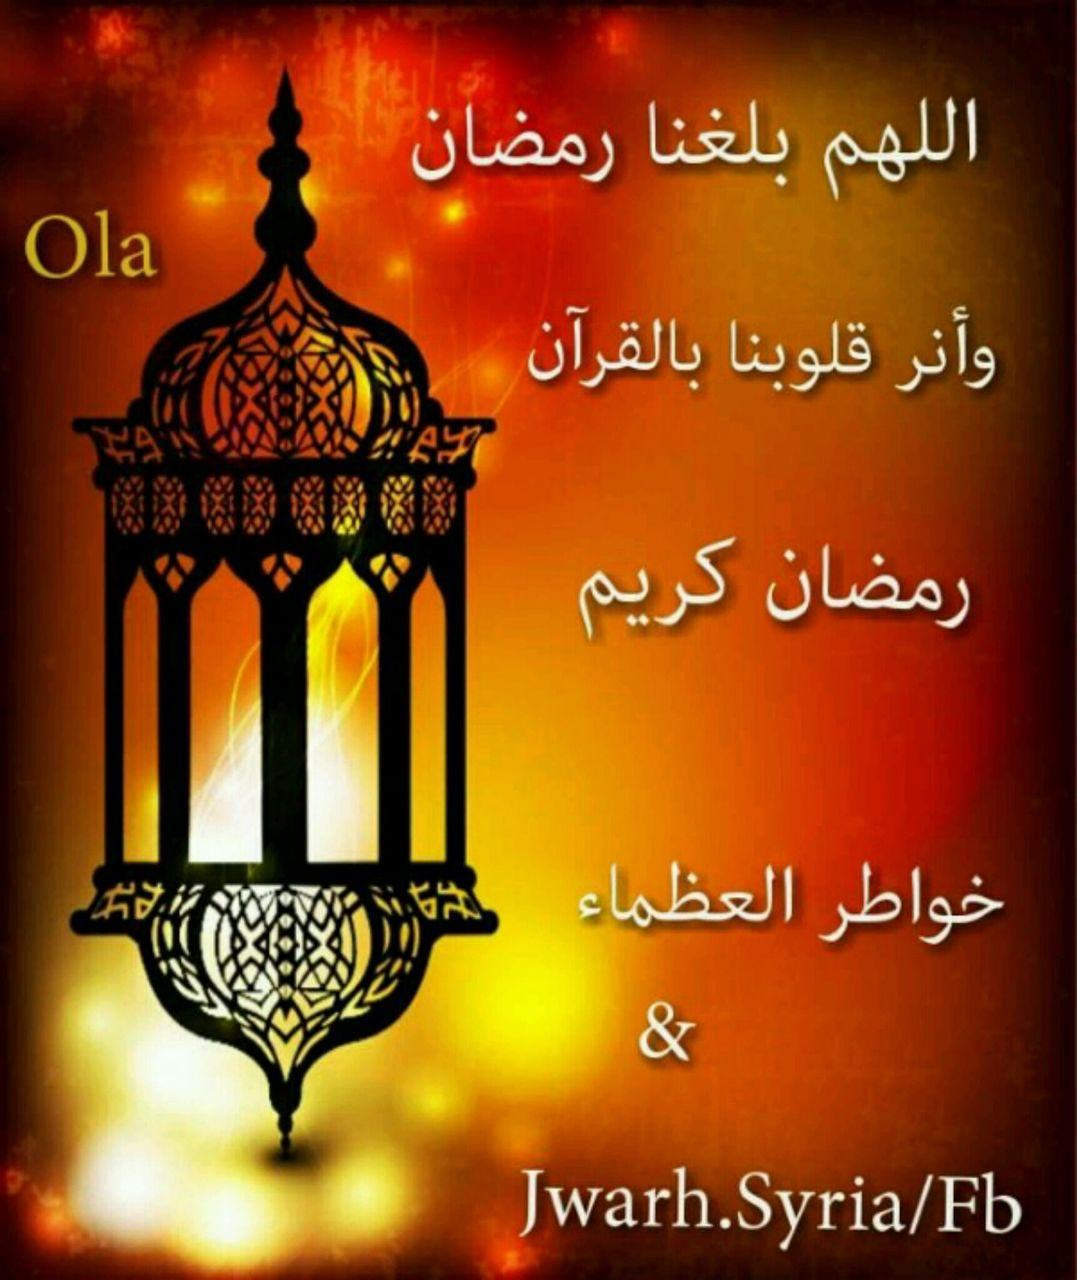 صور رمضان 2020 أجمل صور فوانيس رمضان 2021 بطاقات تهنئة لرمضان تهنئة رمضان بالأسماء 32